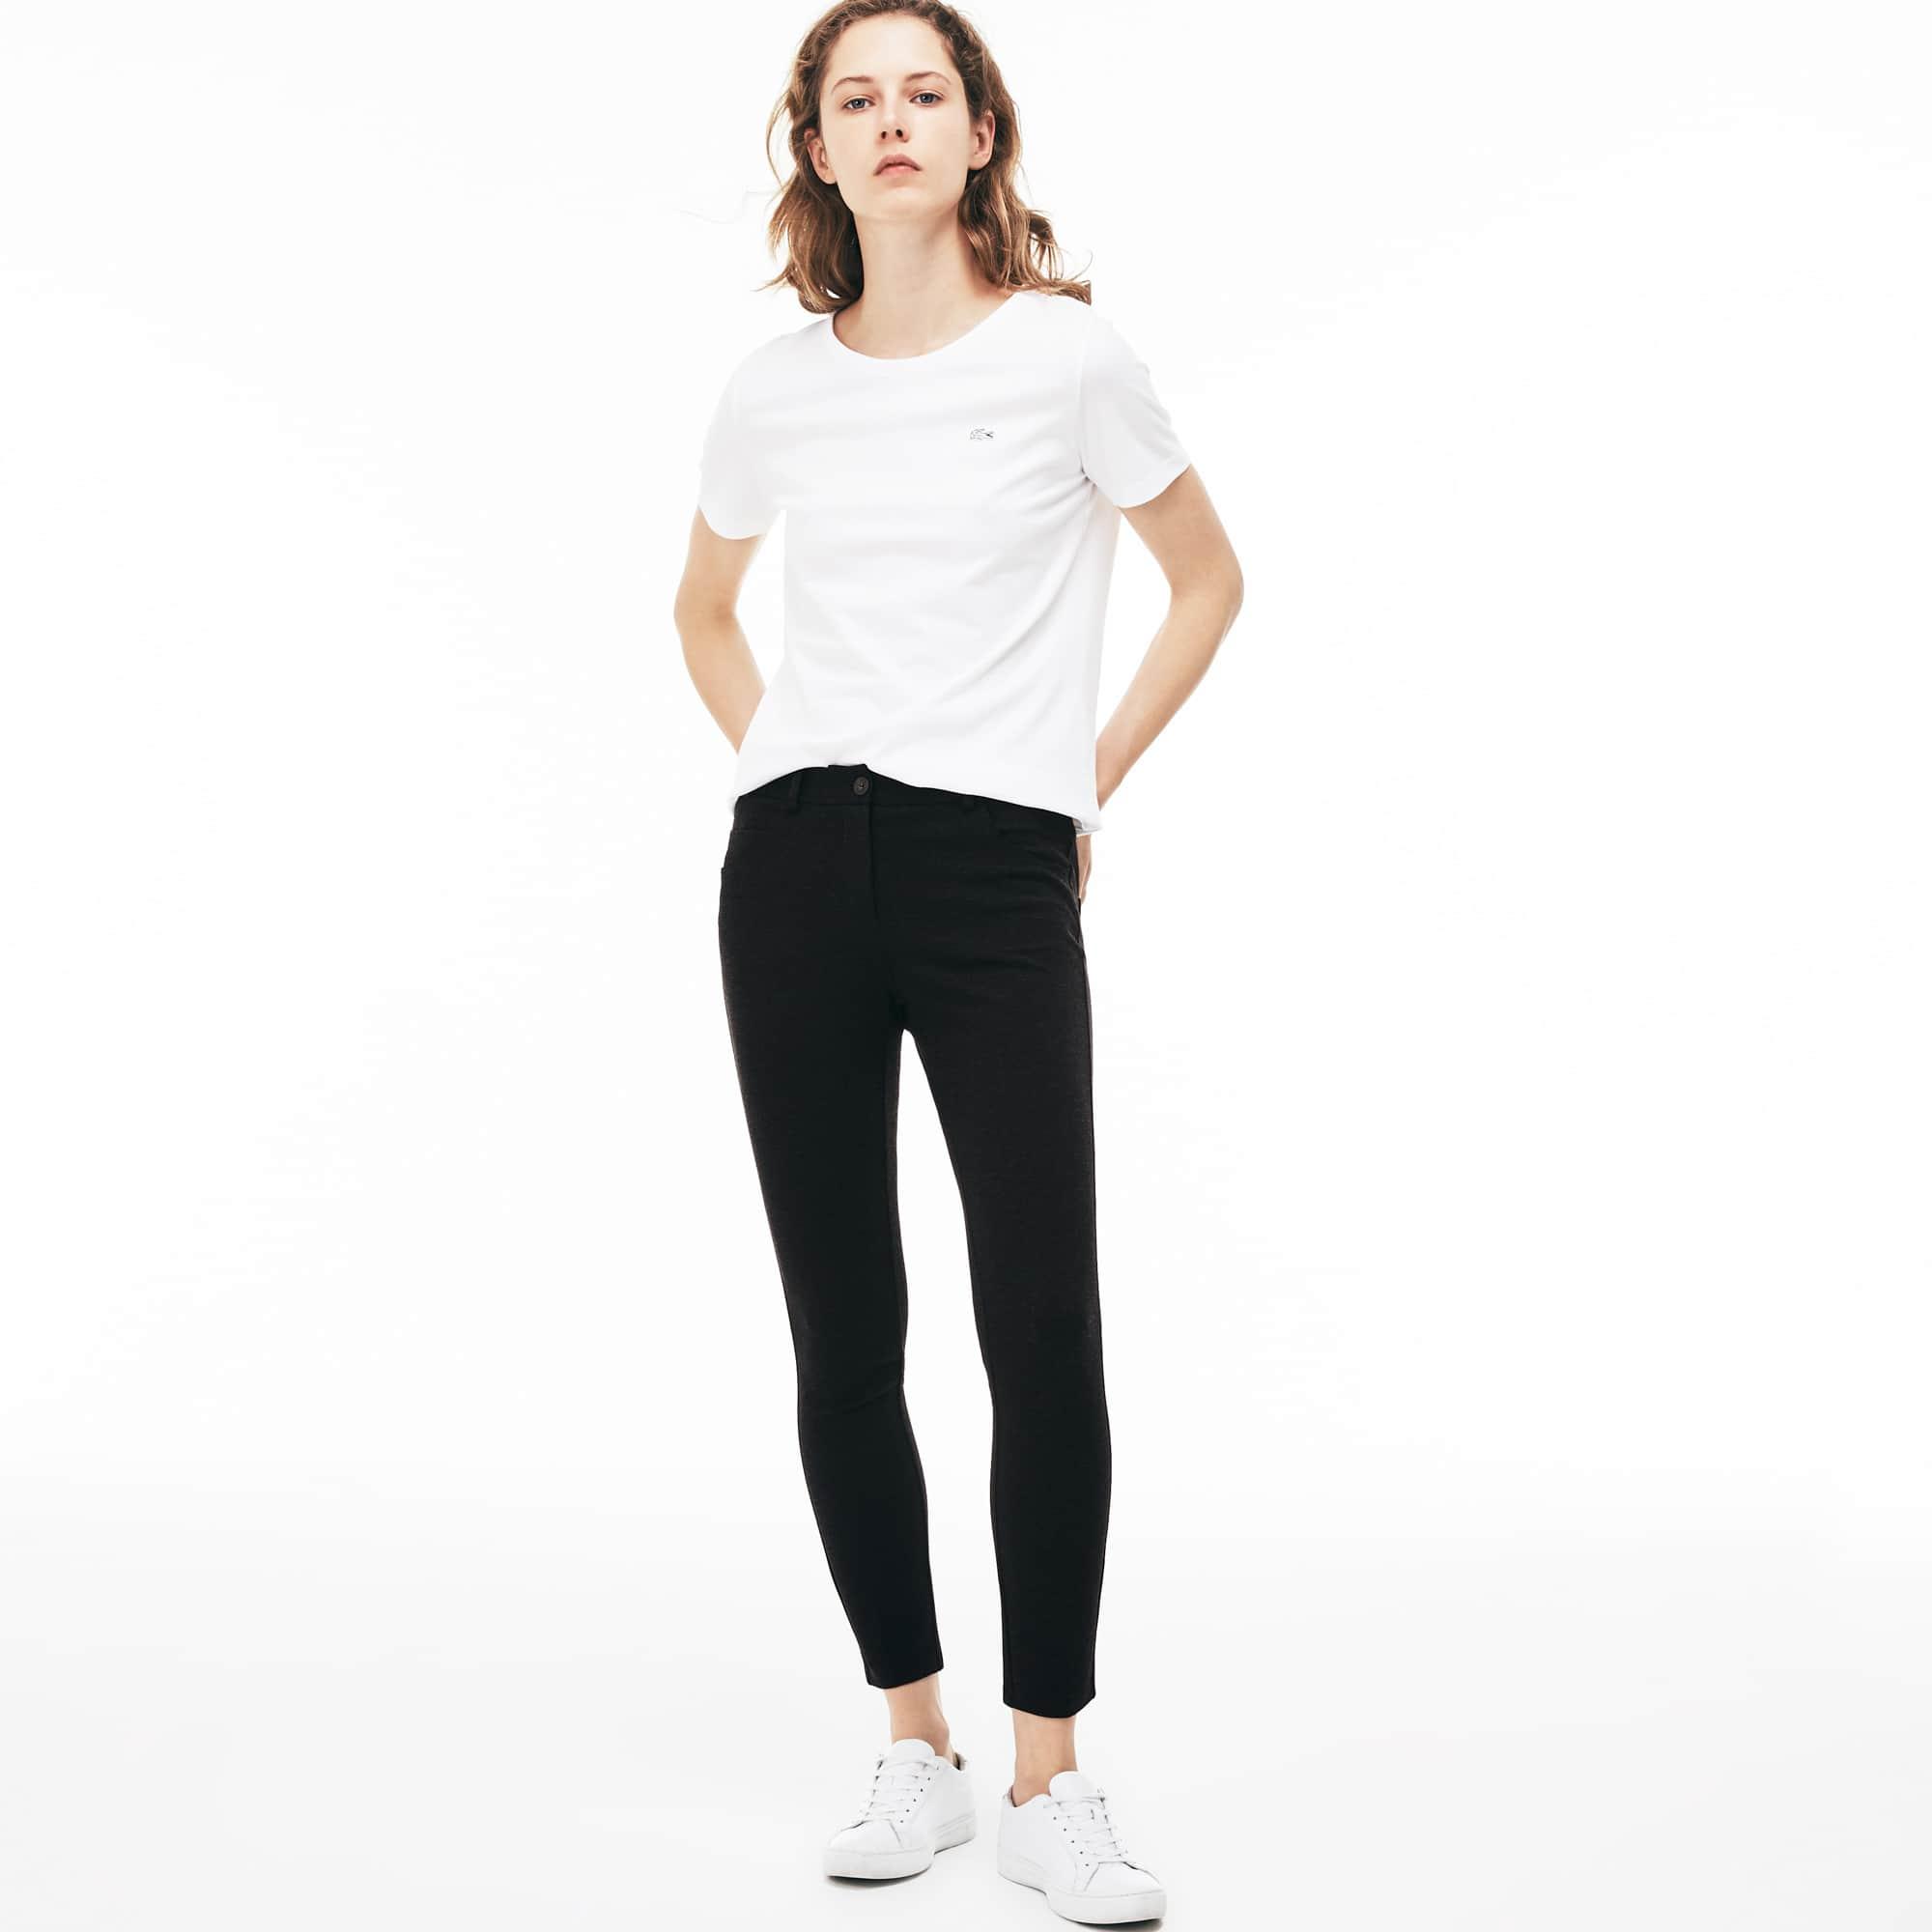 Pantalon 5 poches en maille milano stretch unie